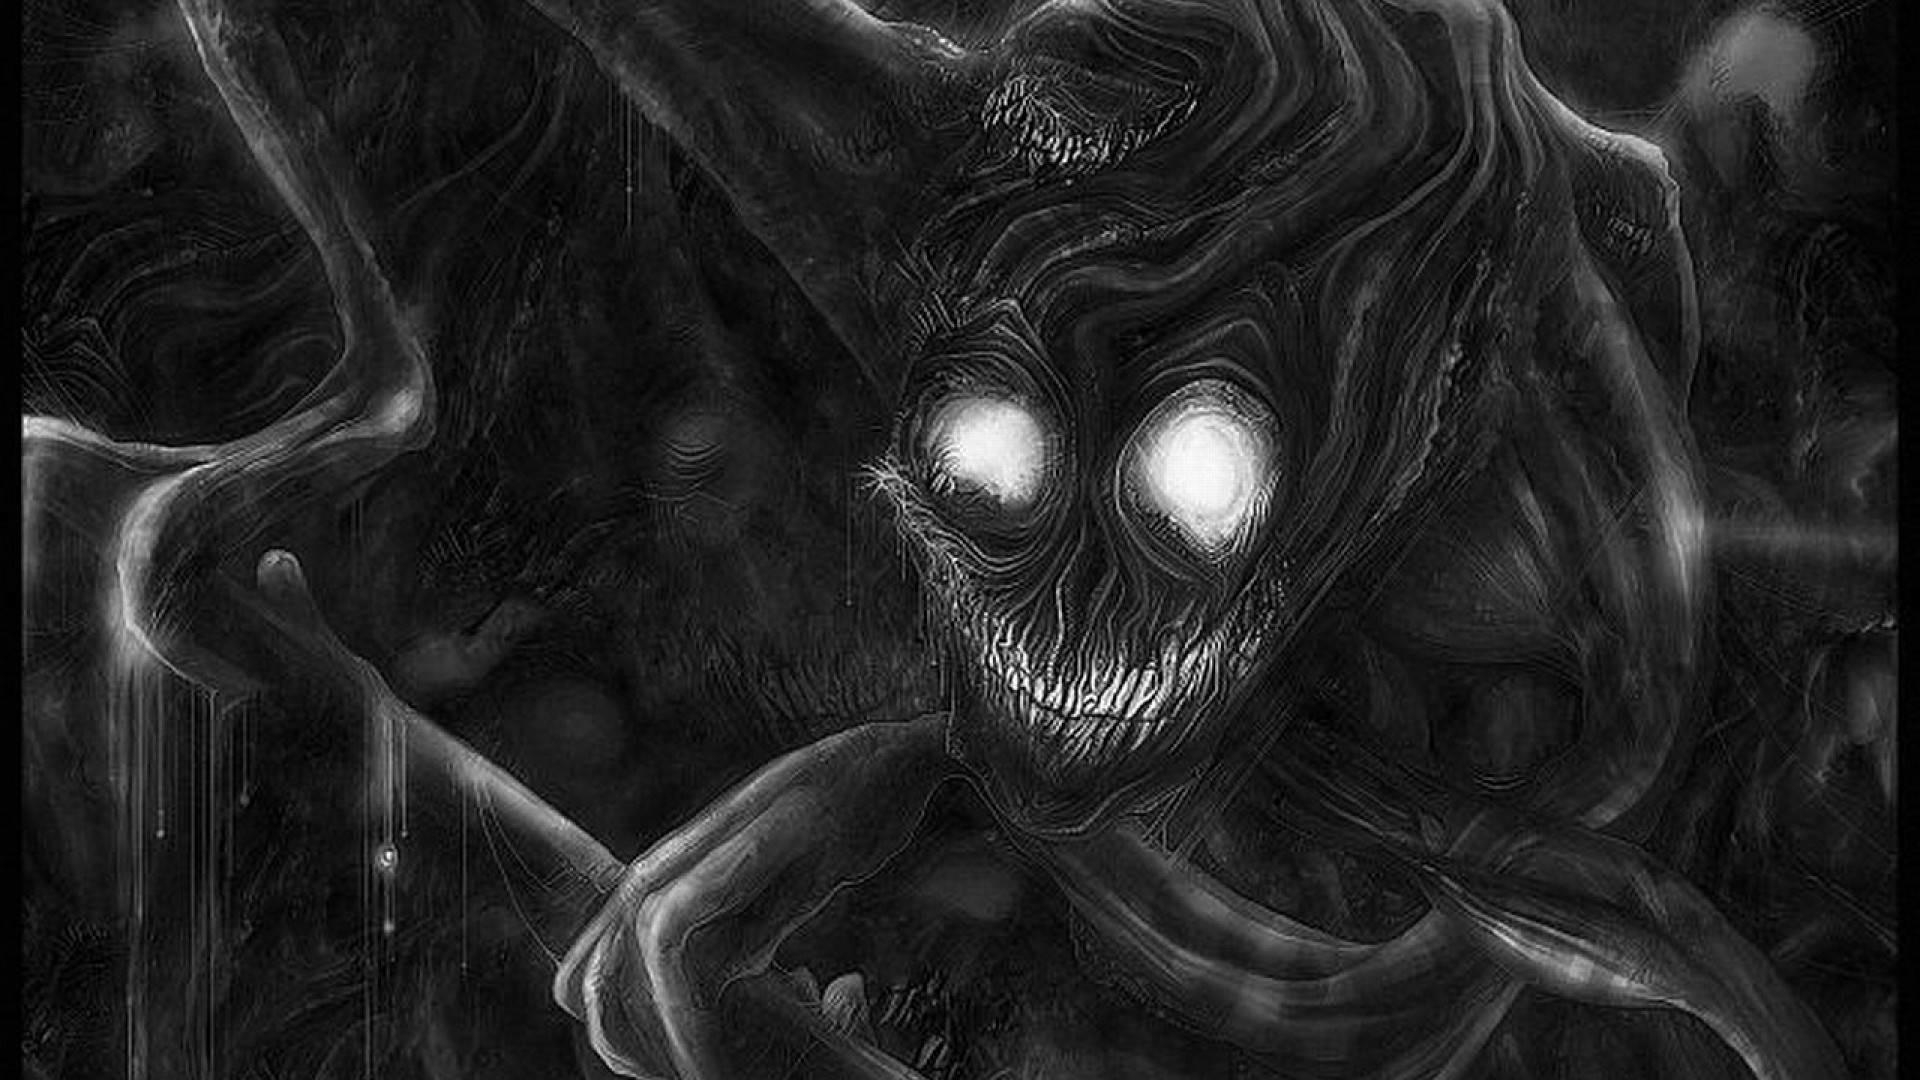 Creepy Anime Wallpaper 58 Images